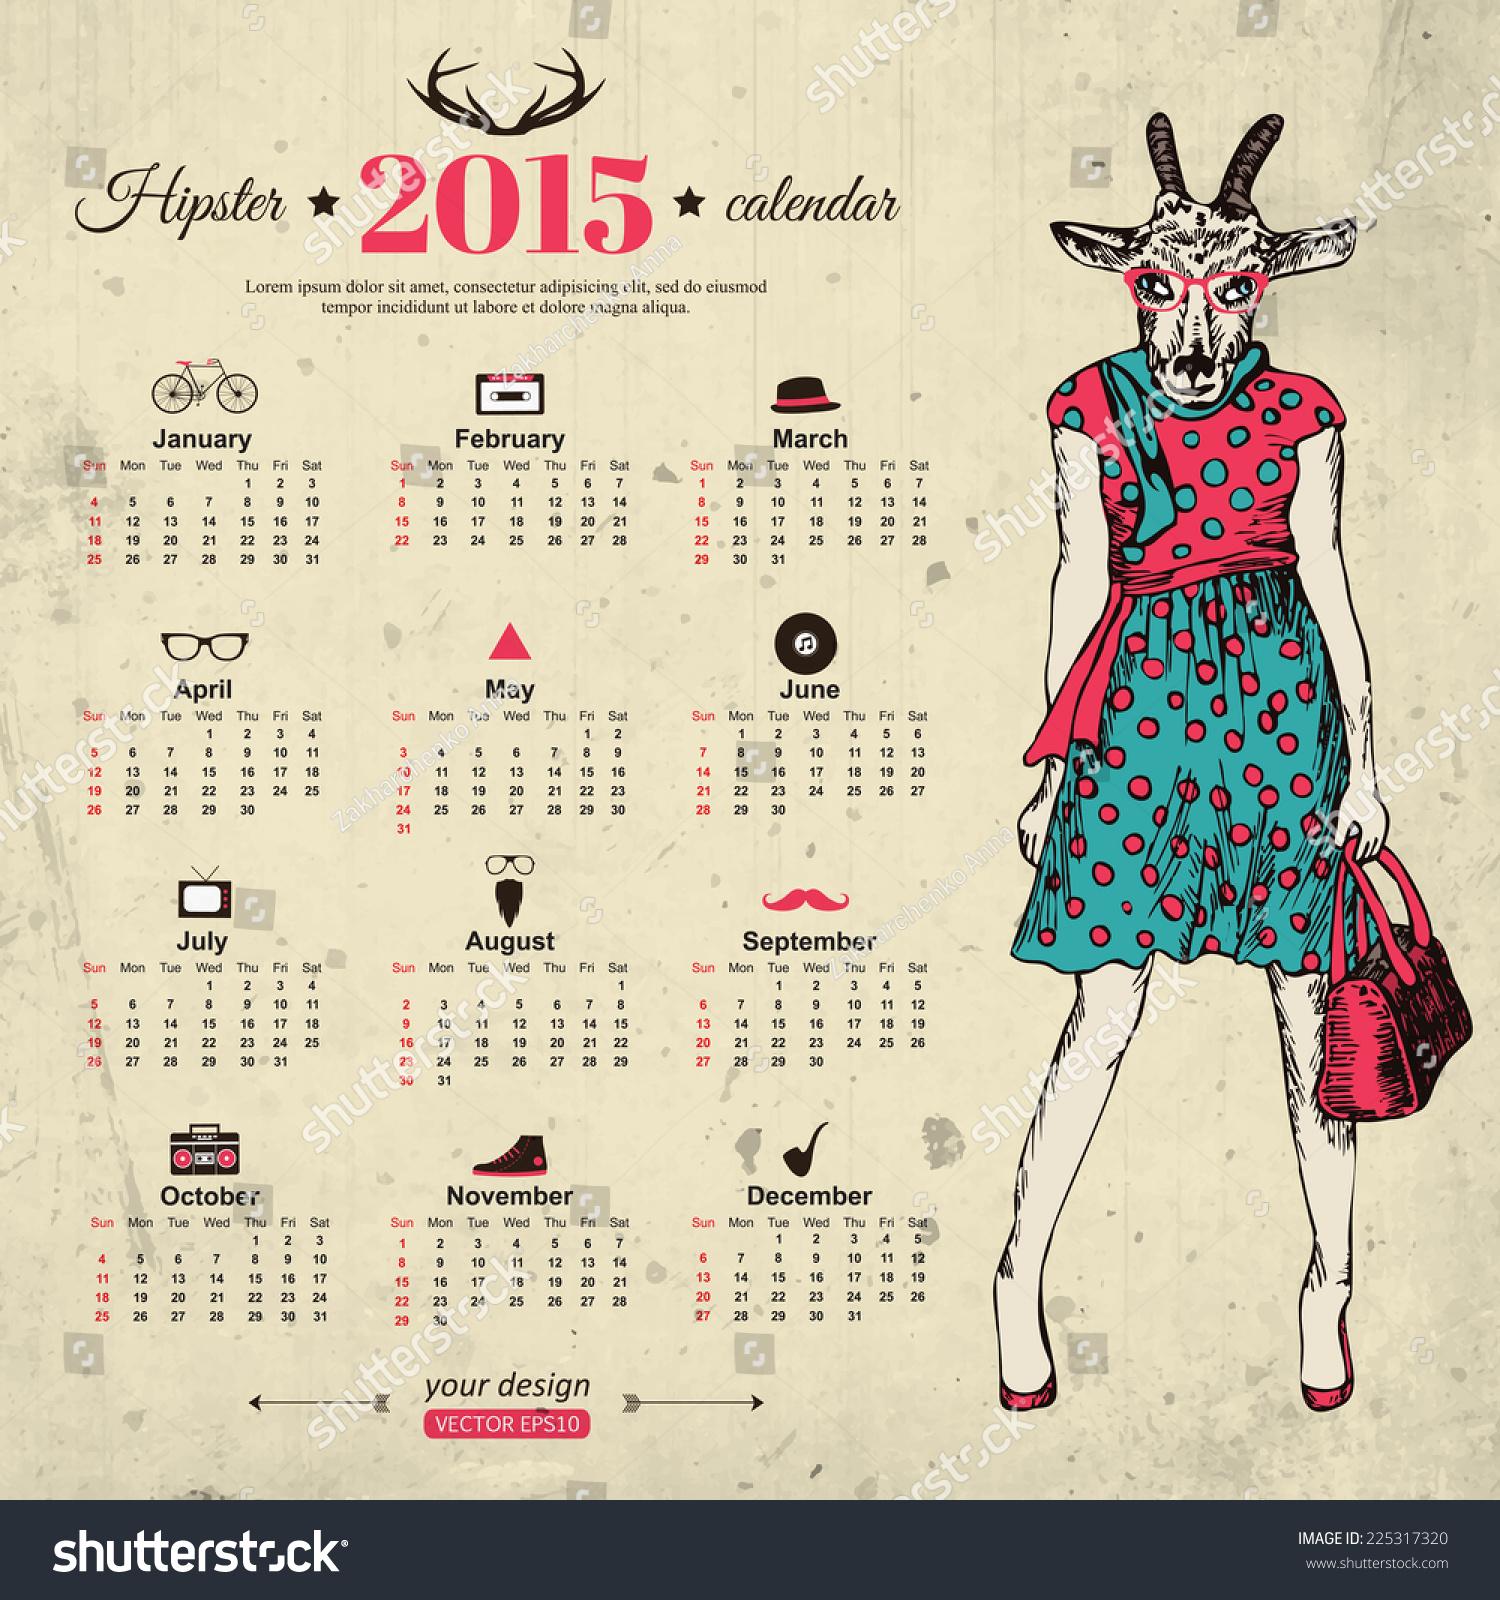 Illustration Calendar Design : Calendar template hipster design year stock vector